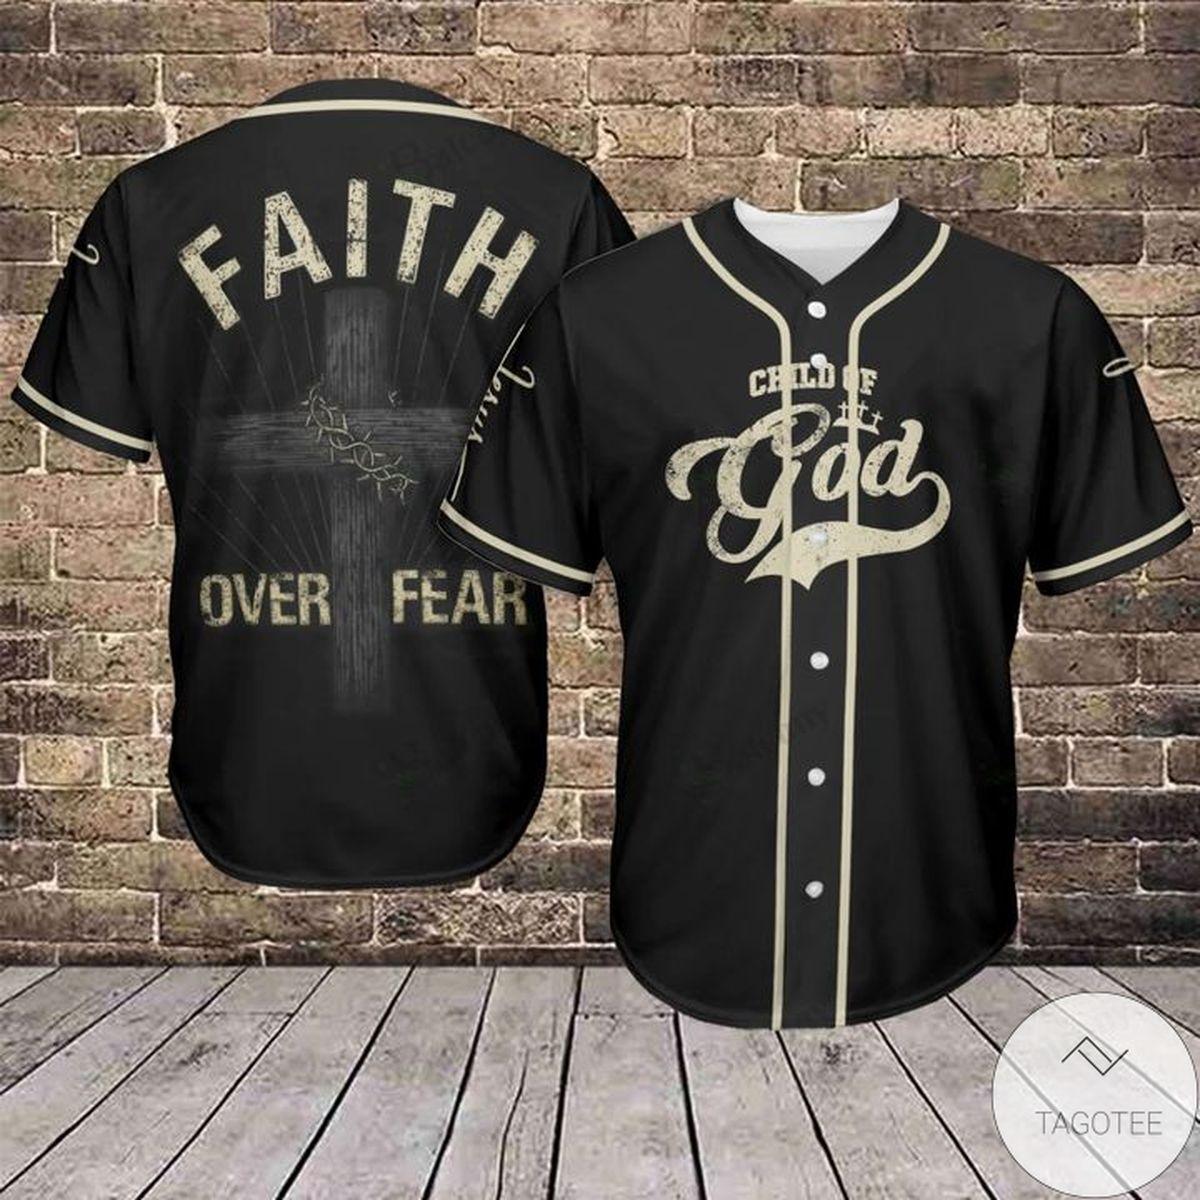 Jesus Child Of God Faith Over Fear Baseball Jersey Shirt